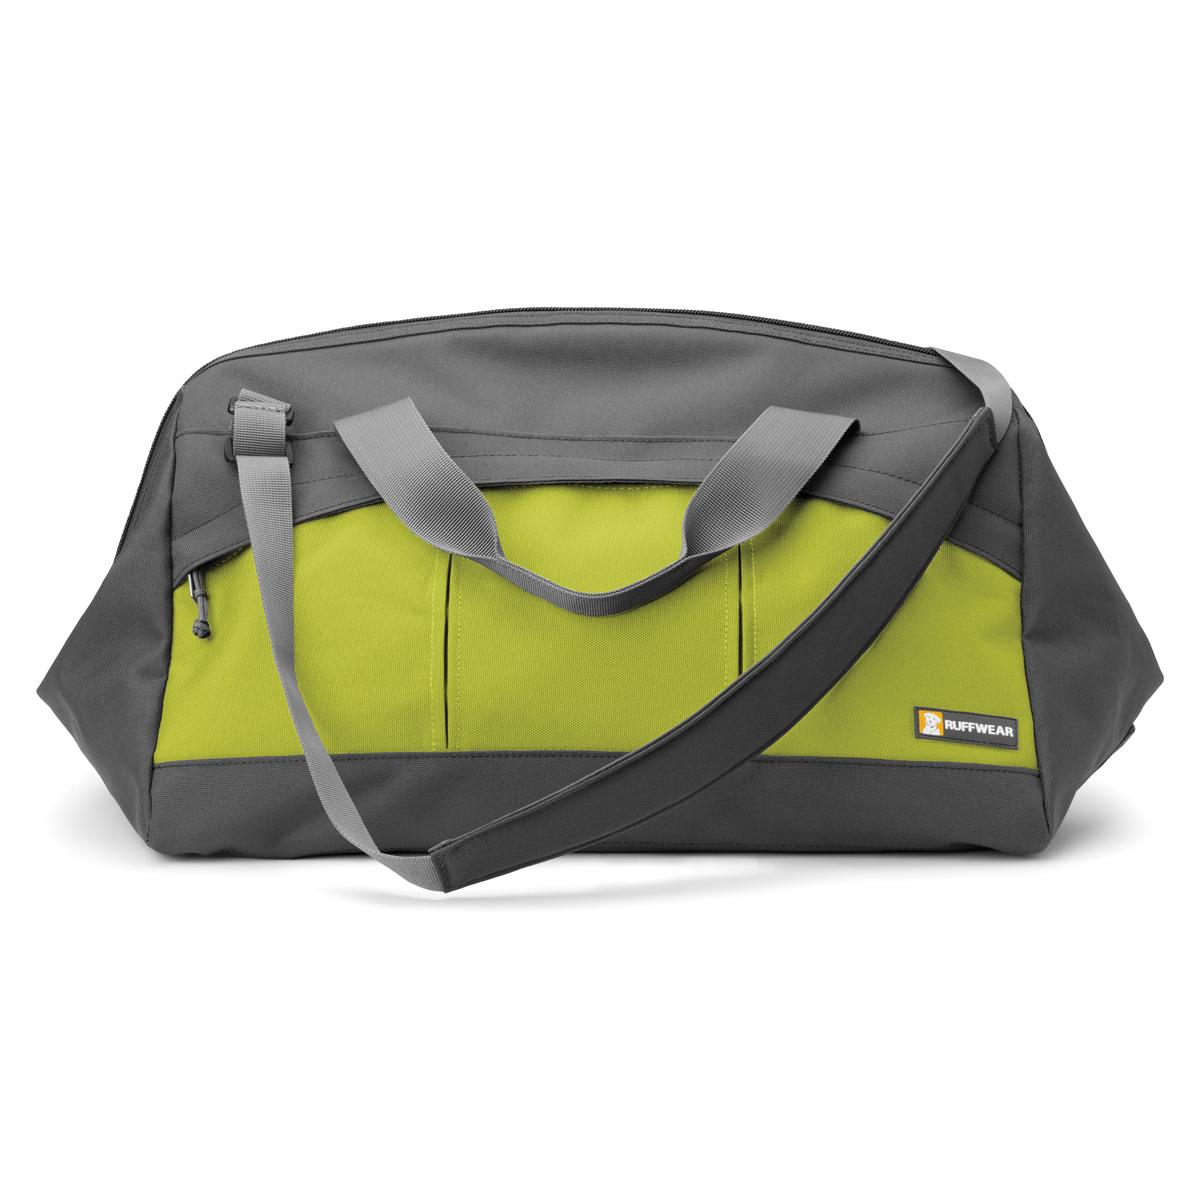 ruffwear haul bag forest green baxterboo